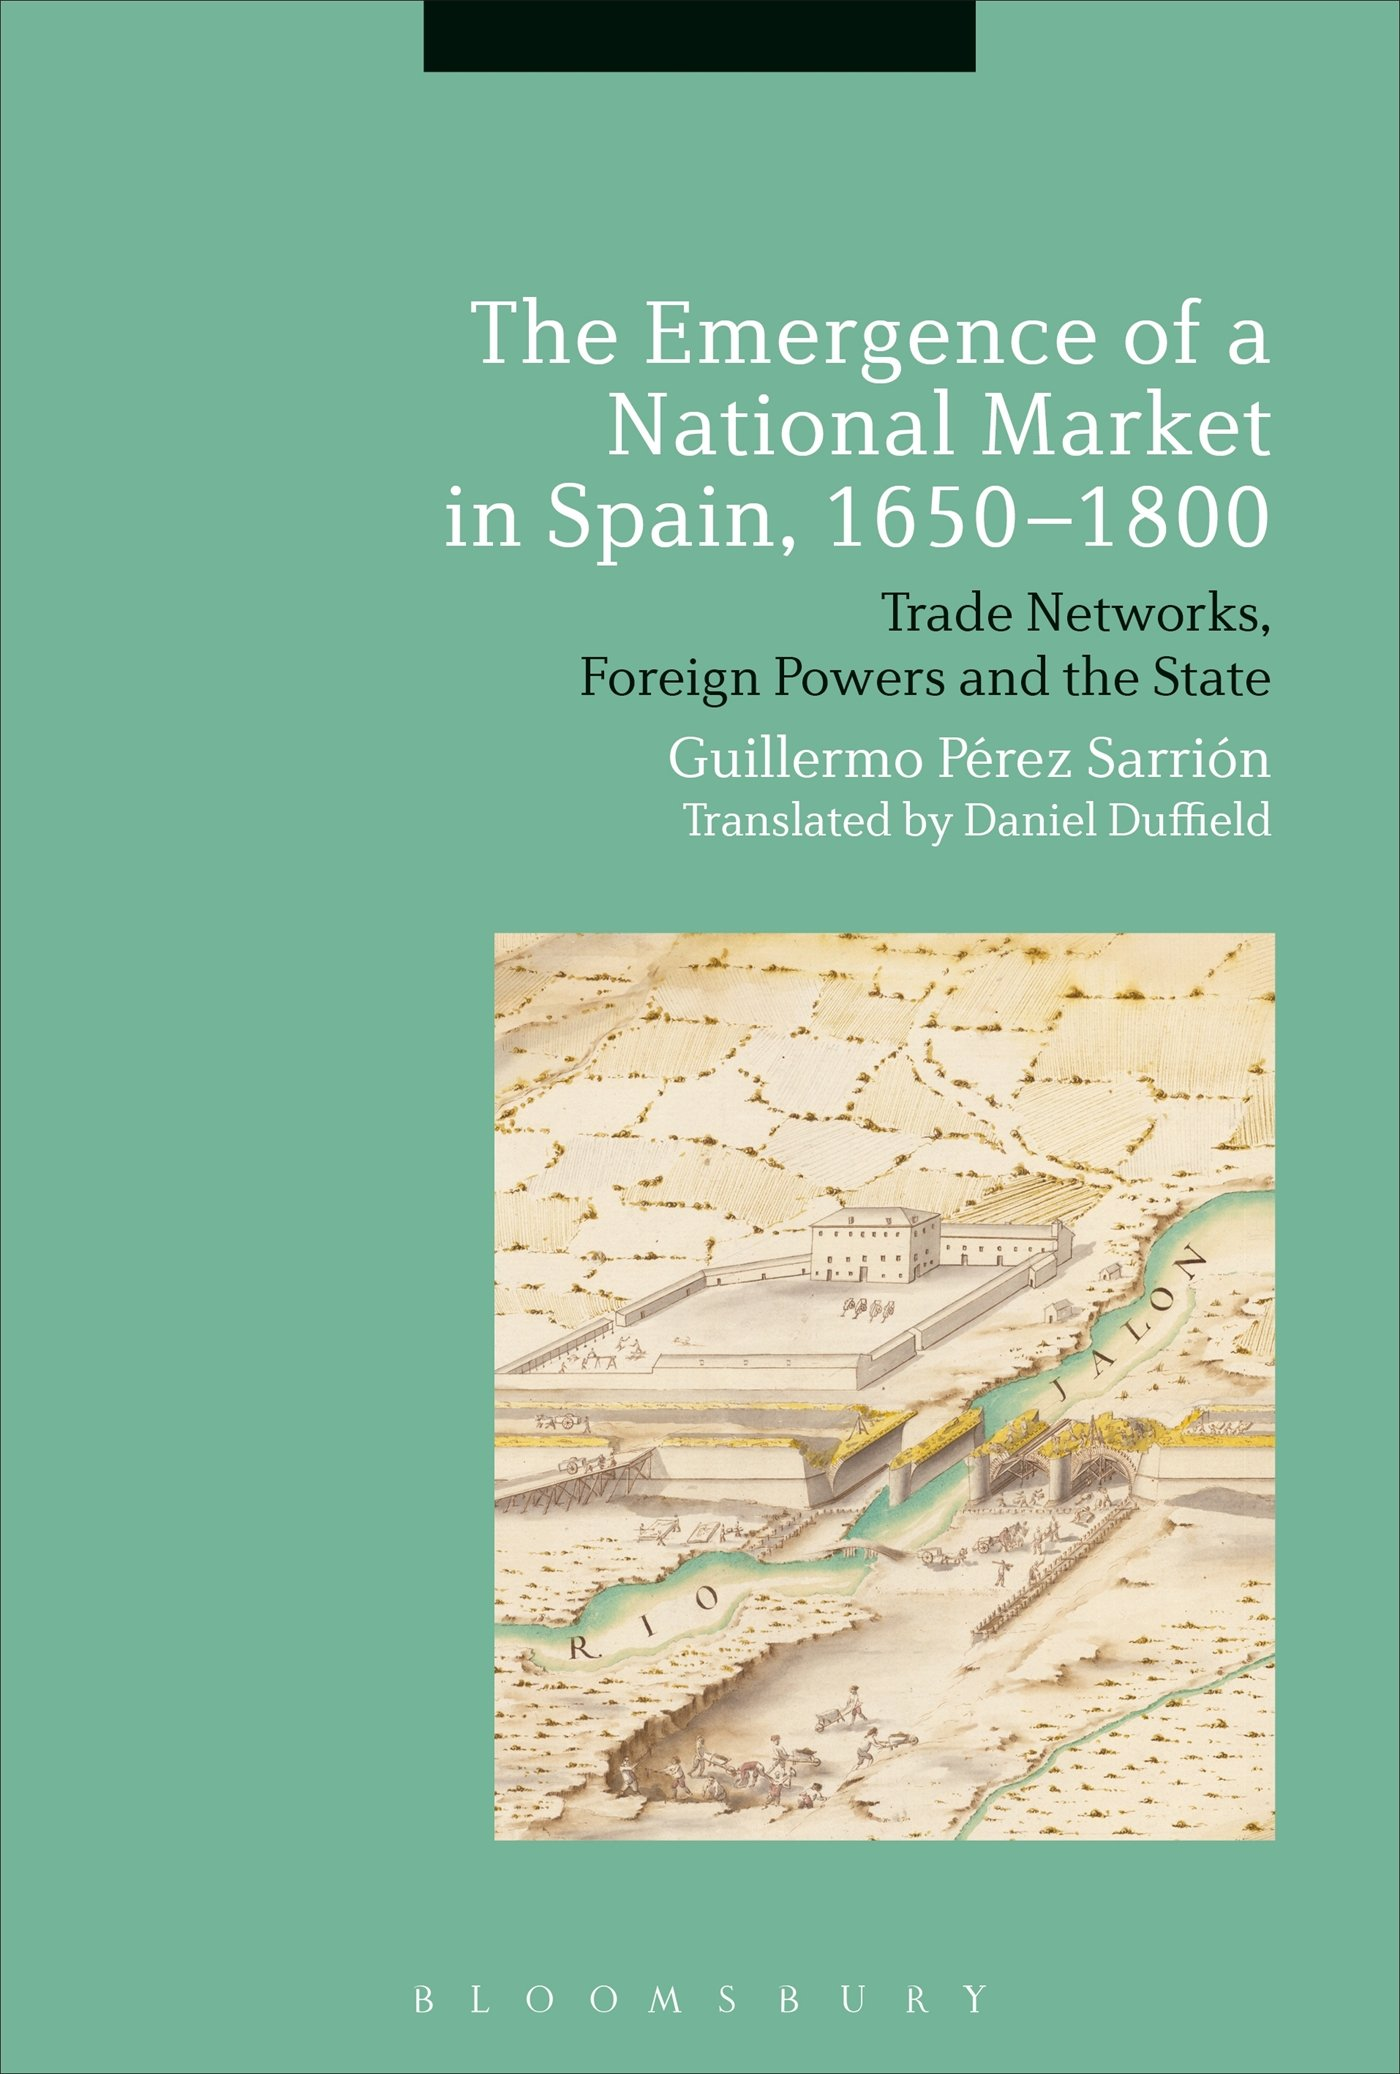 The Emergence of a National Market in Spain, 1650-1800: Amazon.es: Sarrion, Guillermo Perez: Libros en idiomas extranjeros